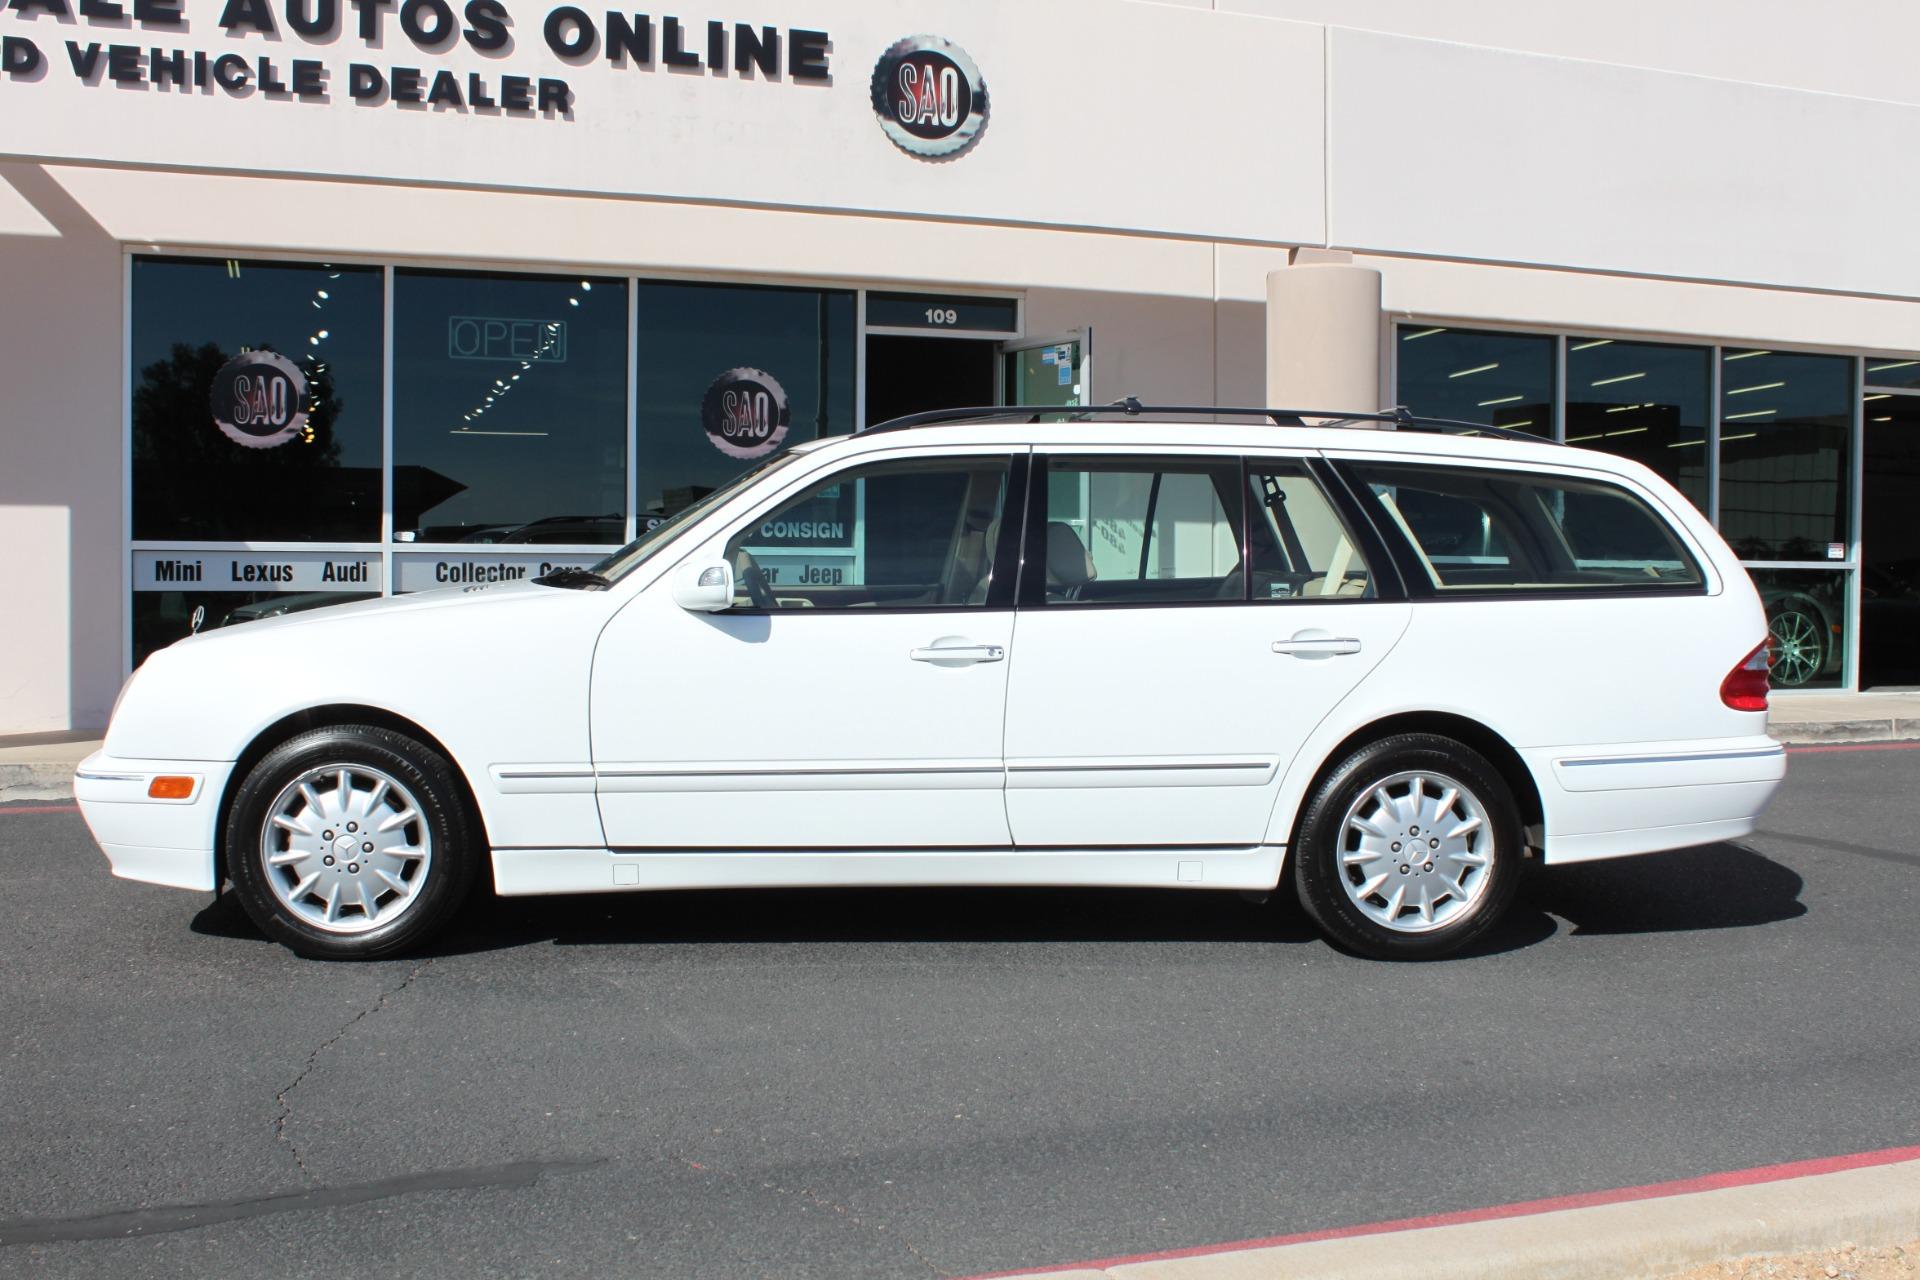 Used-2000-Mercedes-Benz-E-Class-Wagoneer